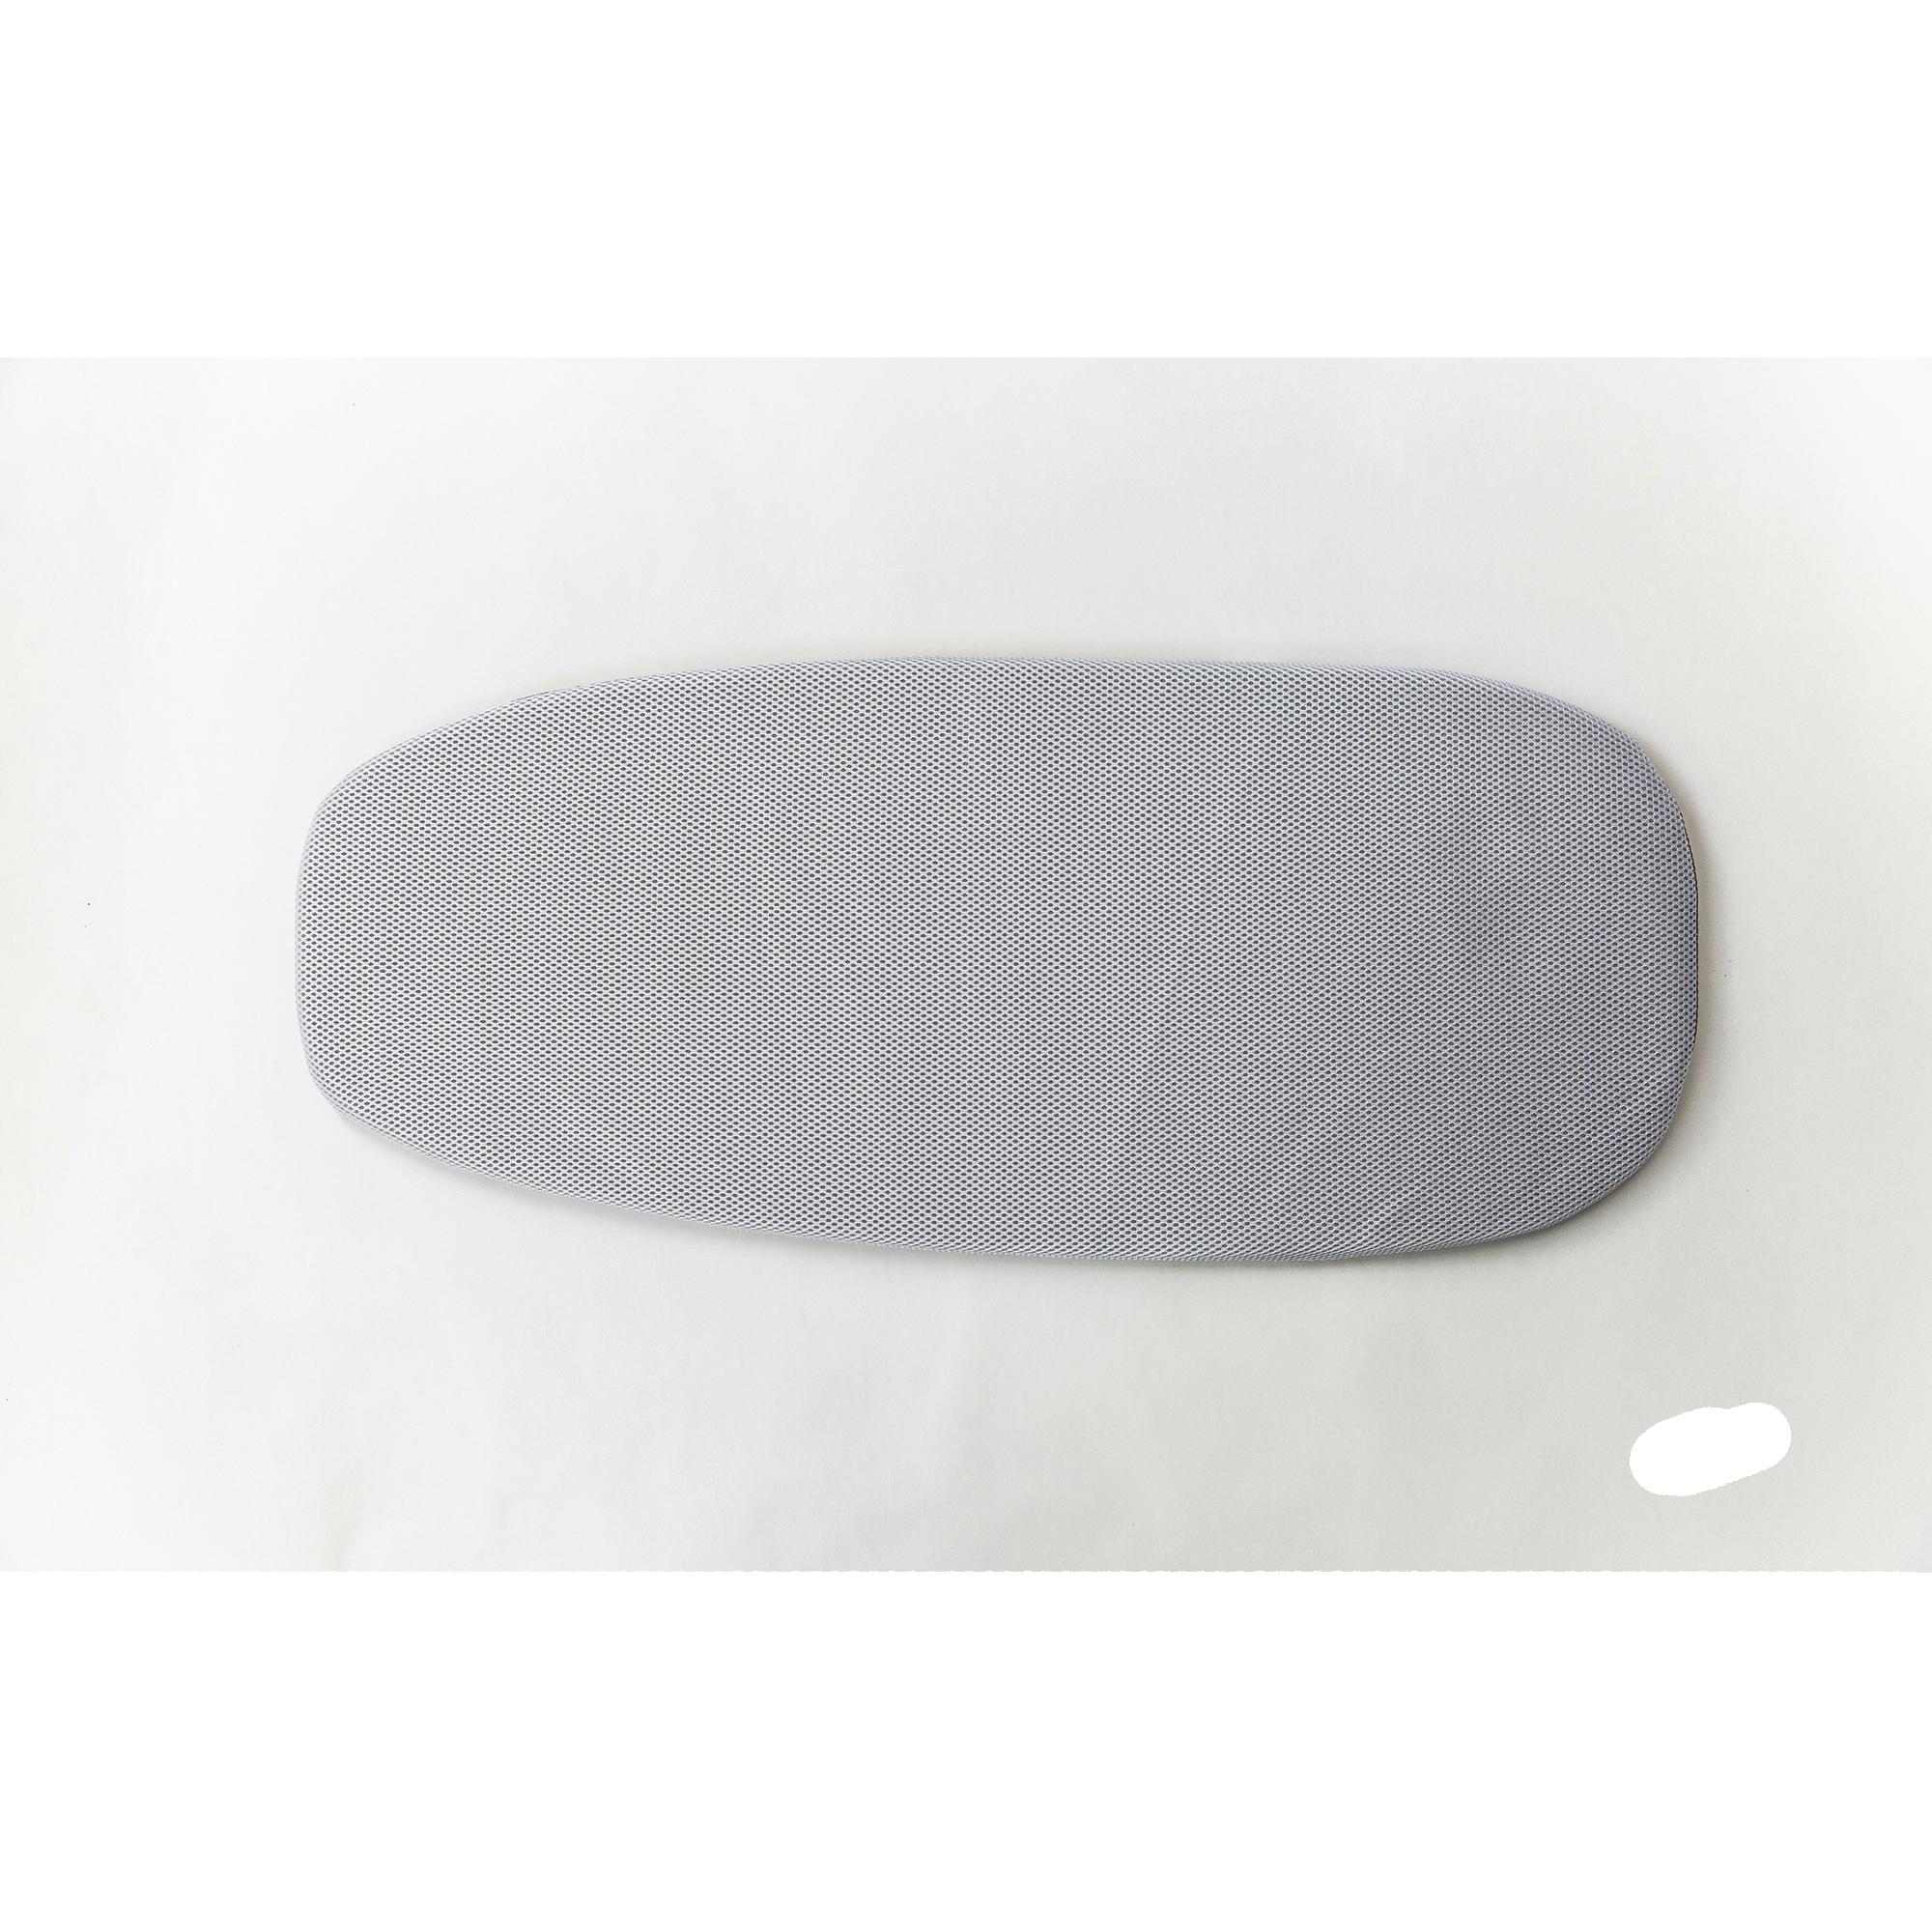 Joolz Geo upper cot mattress for Joolz Geo pushchair